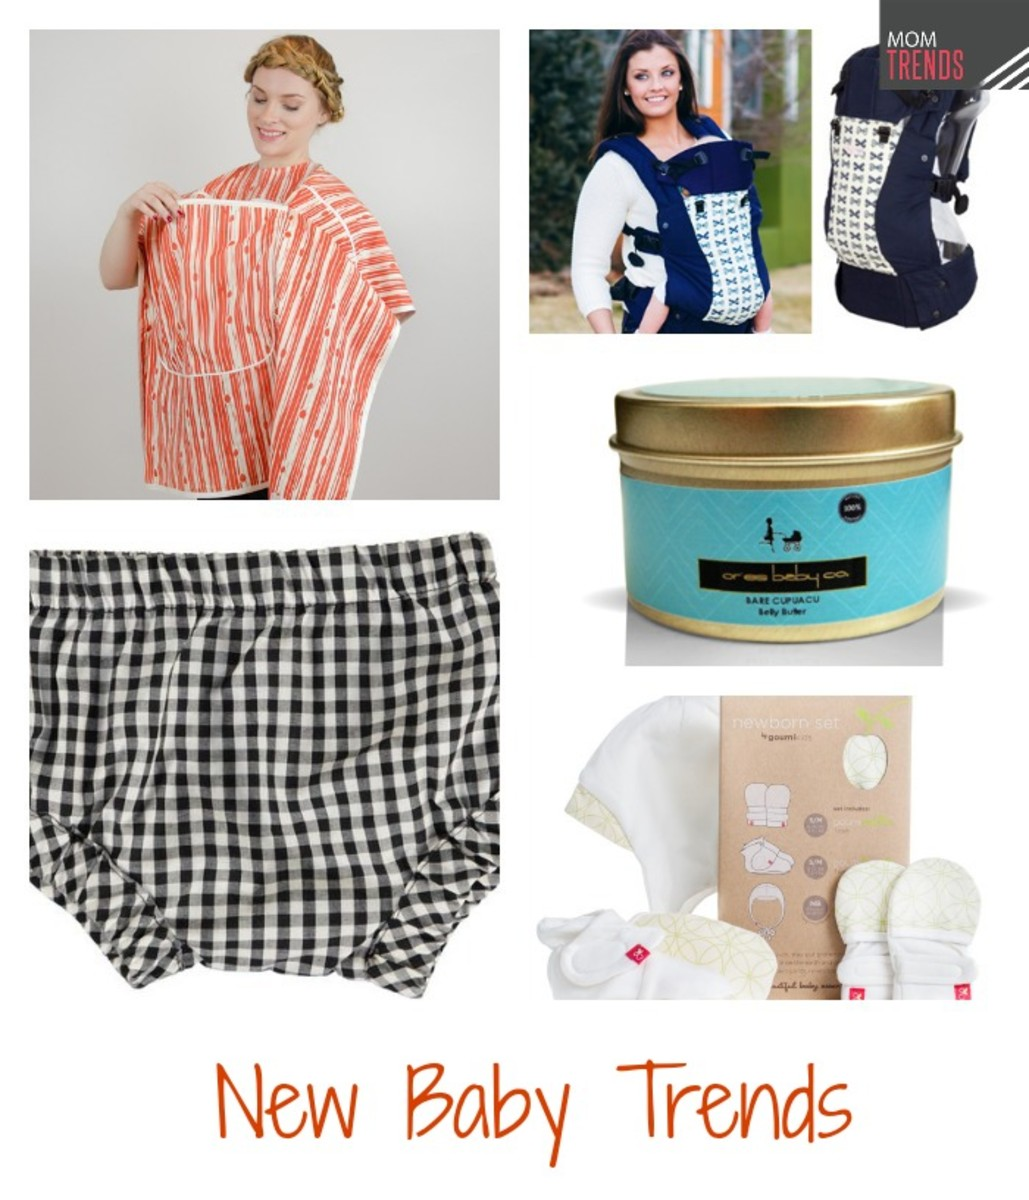 New Baby Trends.jpg.jpg